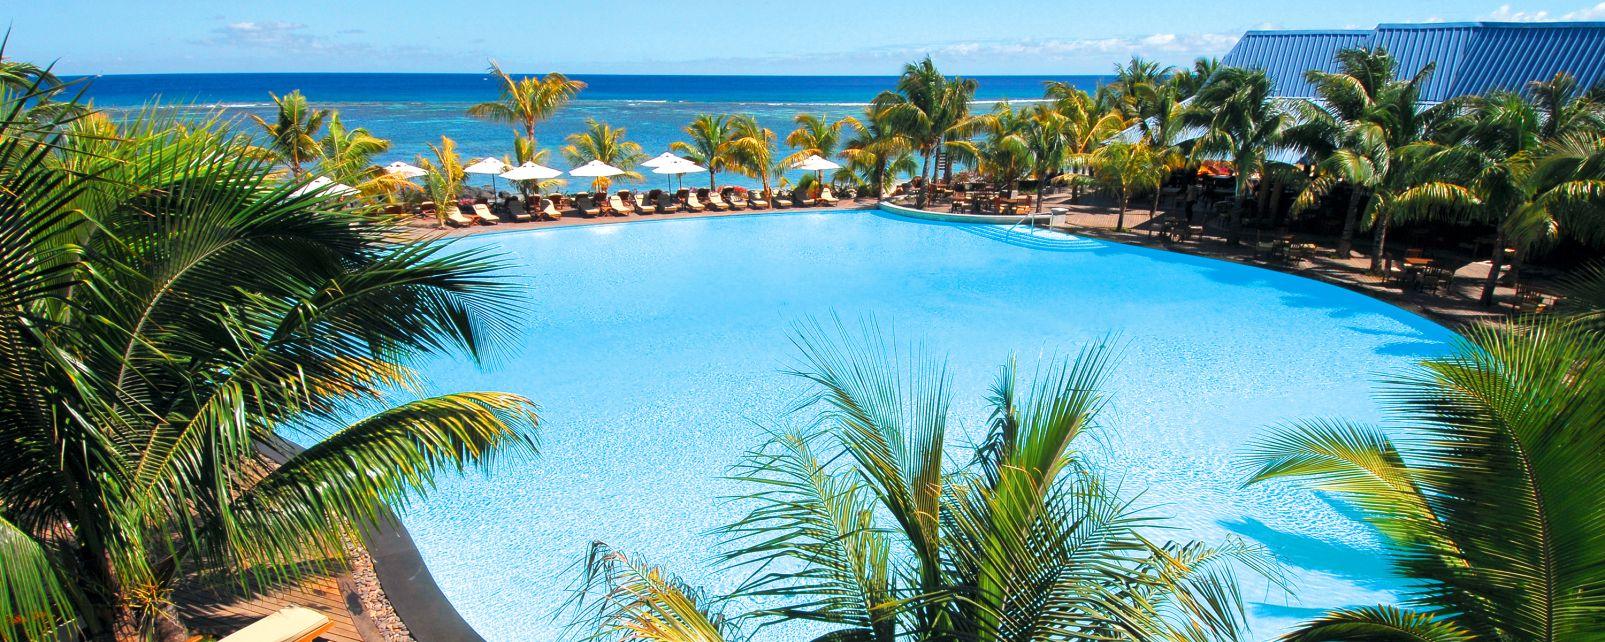 Hotel Victoria Beachcomber Resort Spa